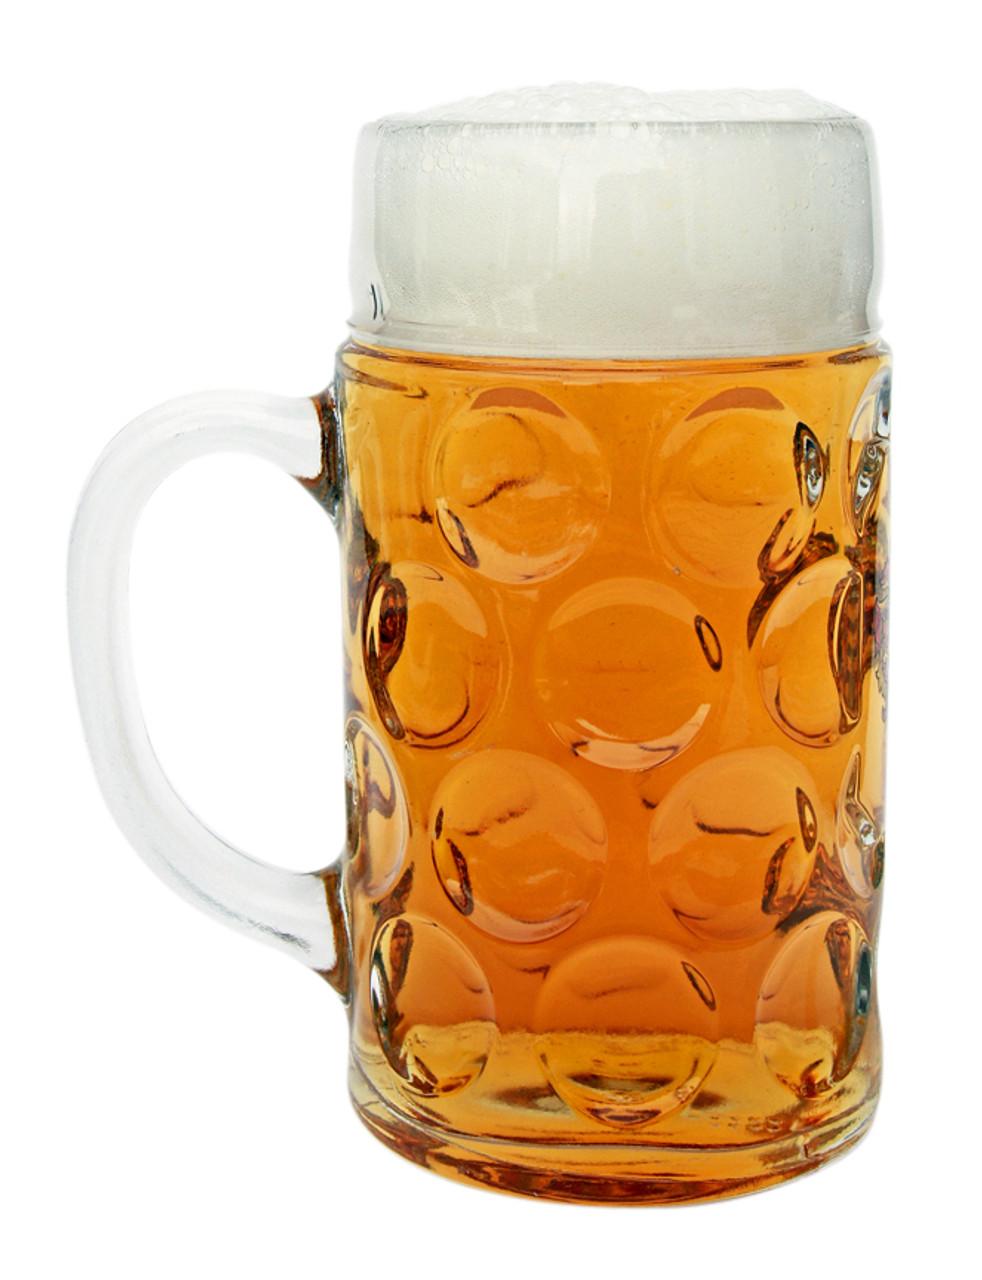 Custom Engraved 1 Liter Rhienland Pfalz Oktoberfest Beer Mug